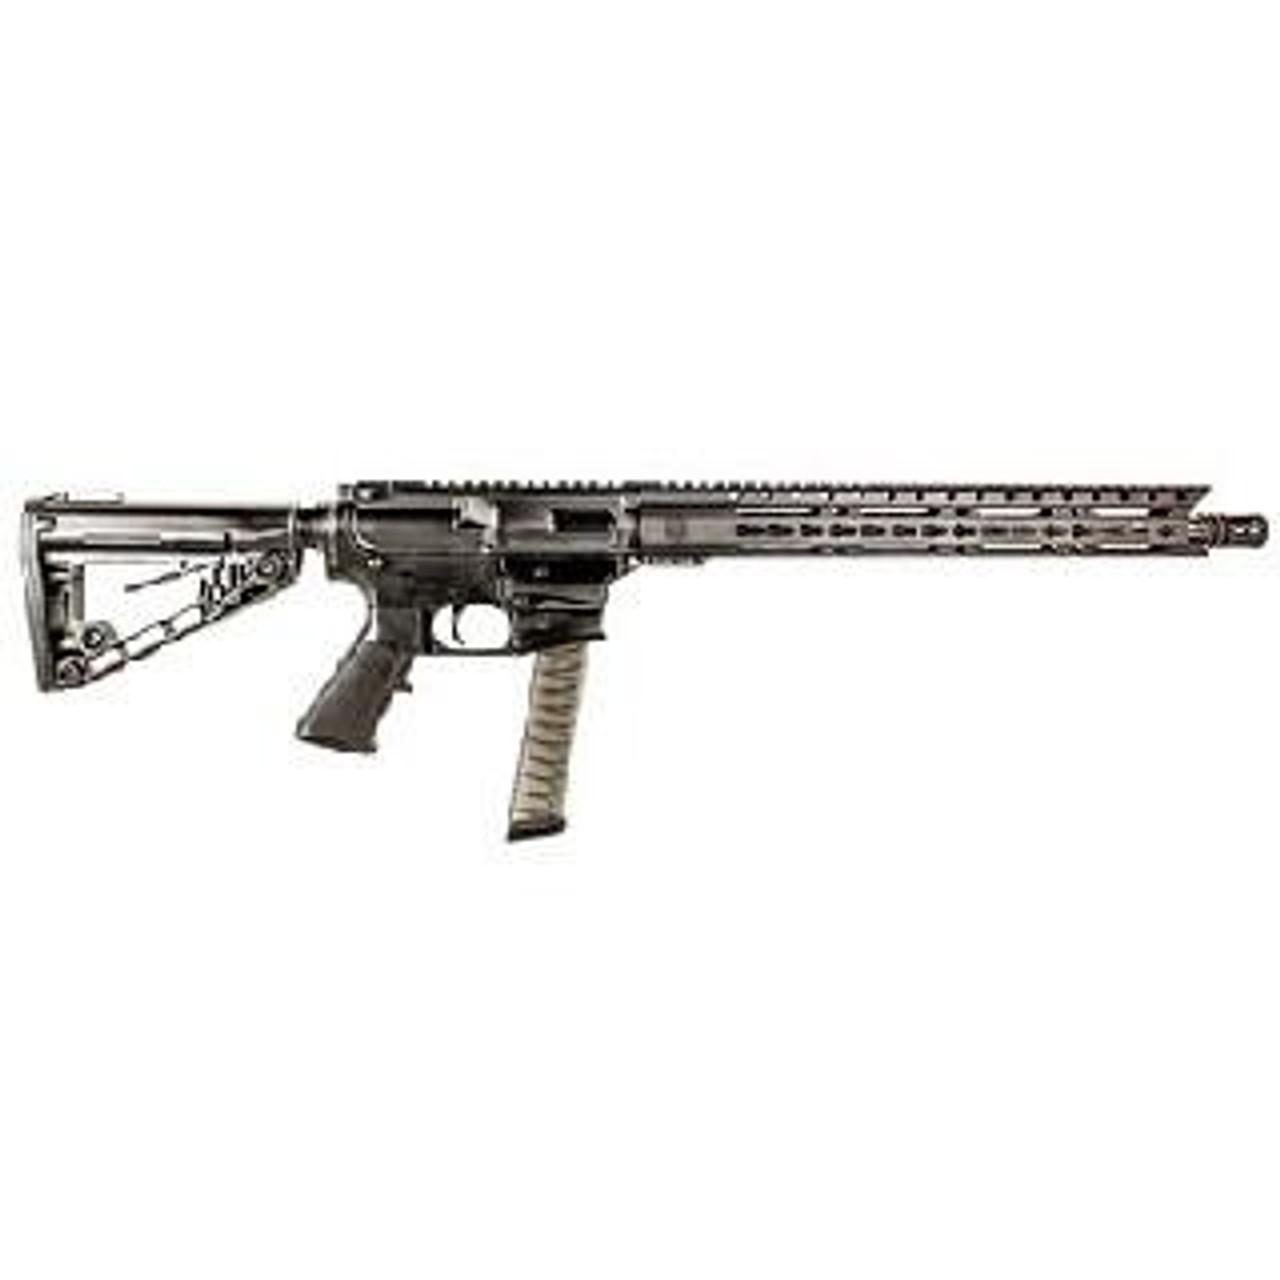 Diamondback DB9RBE- CALIFORNIA LEGAL -9mm